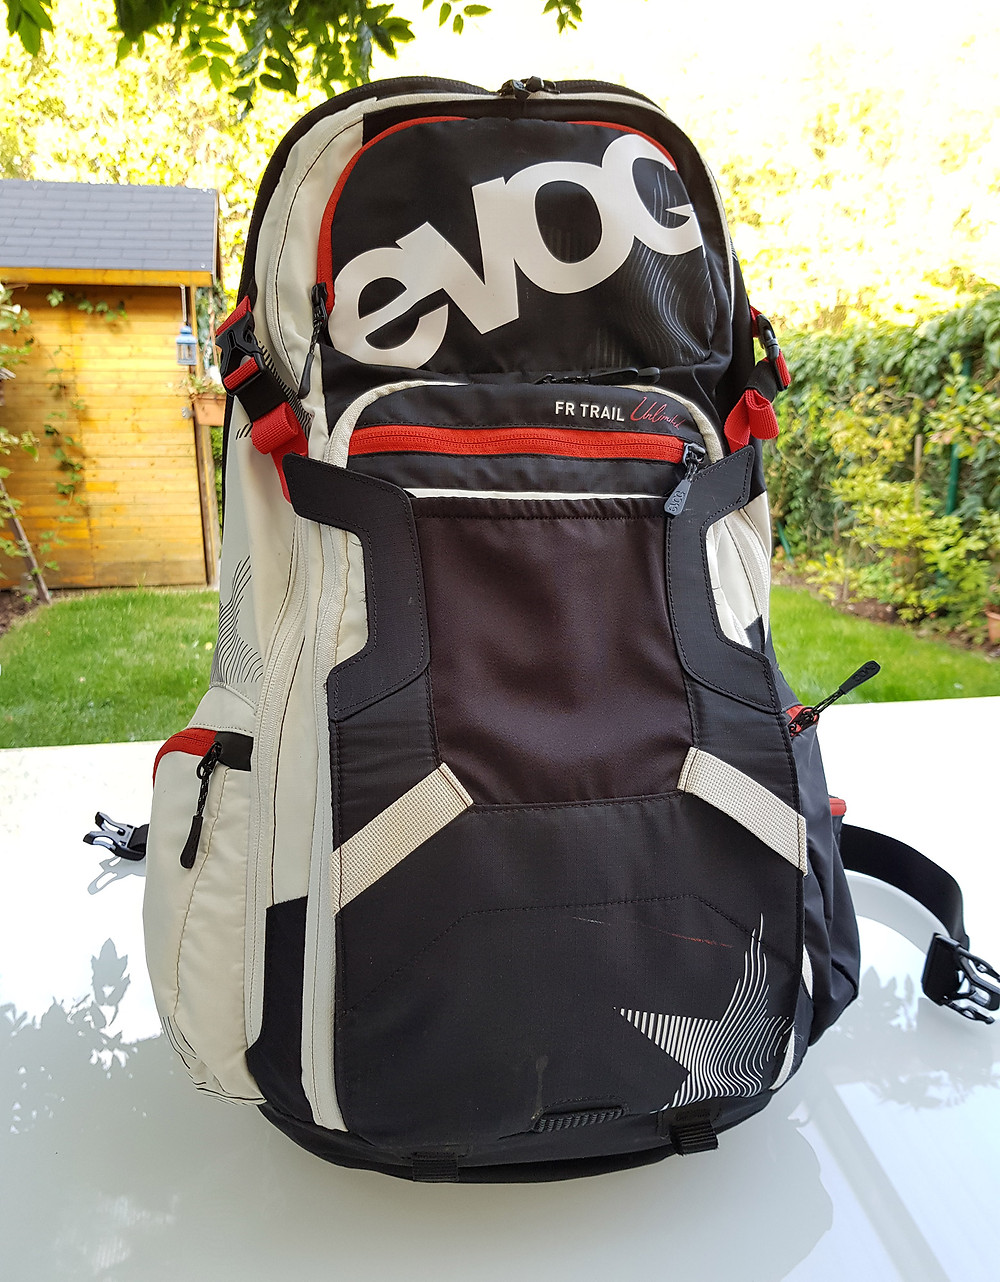 EVOC FR Trail Unlimited